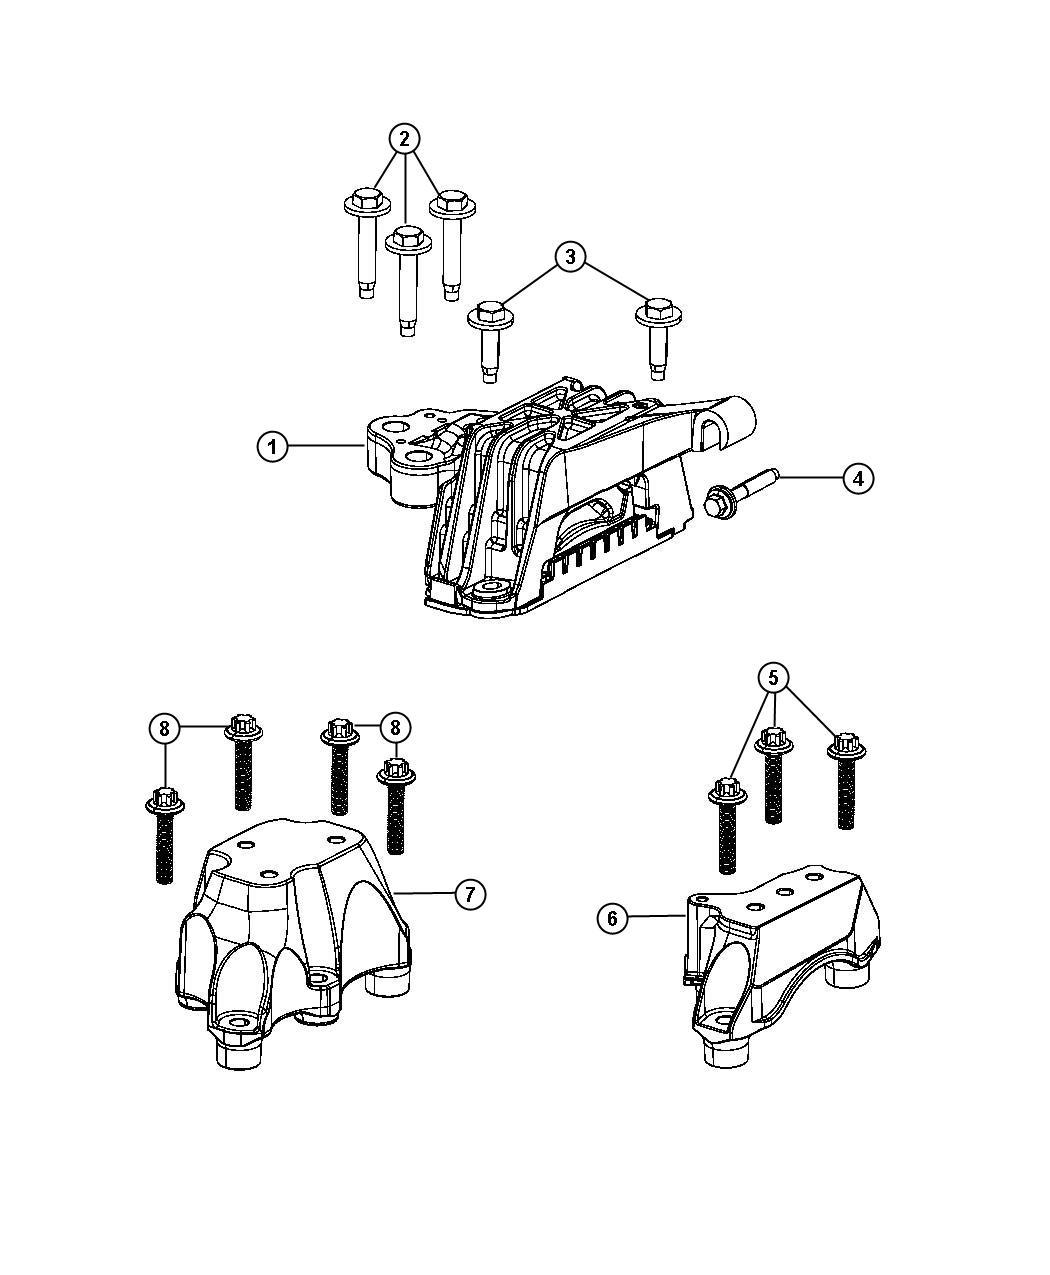 2013 Dodge Dart Bracket. Transmission mount. [6-speed c635